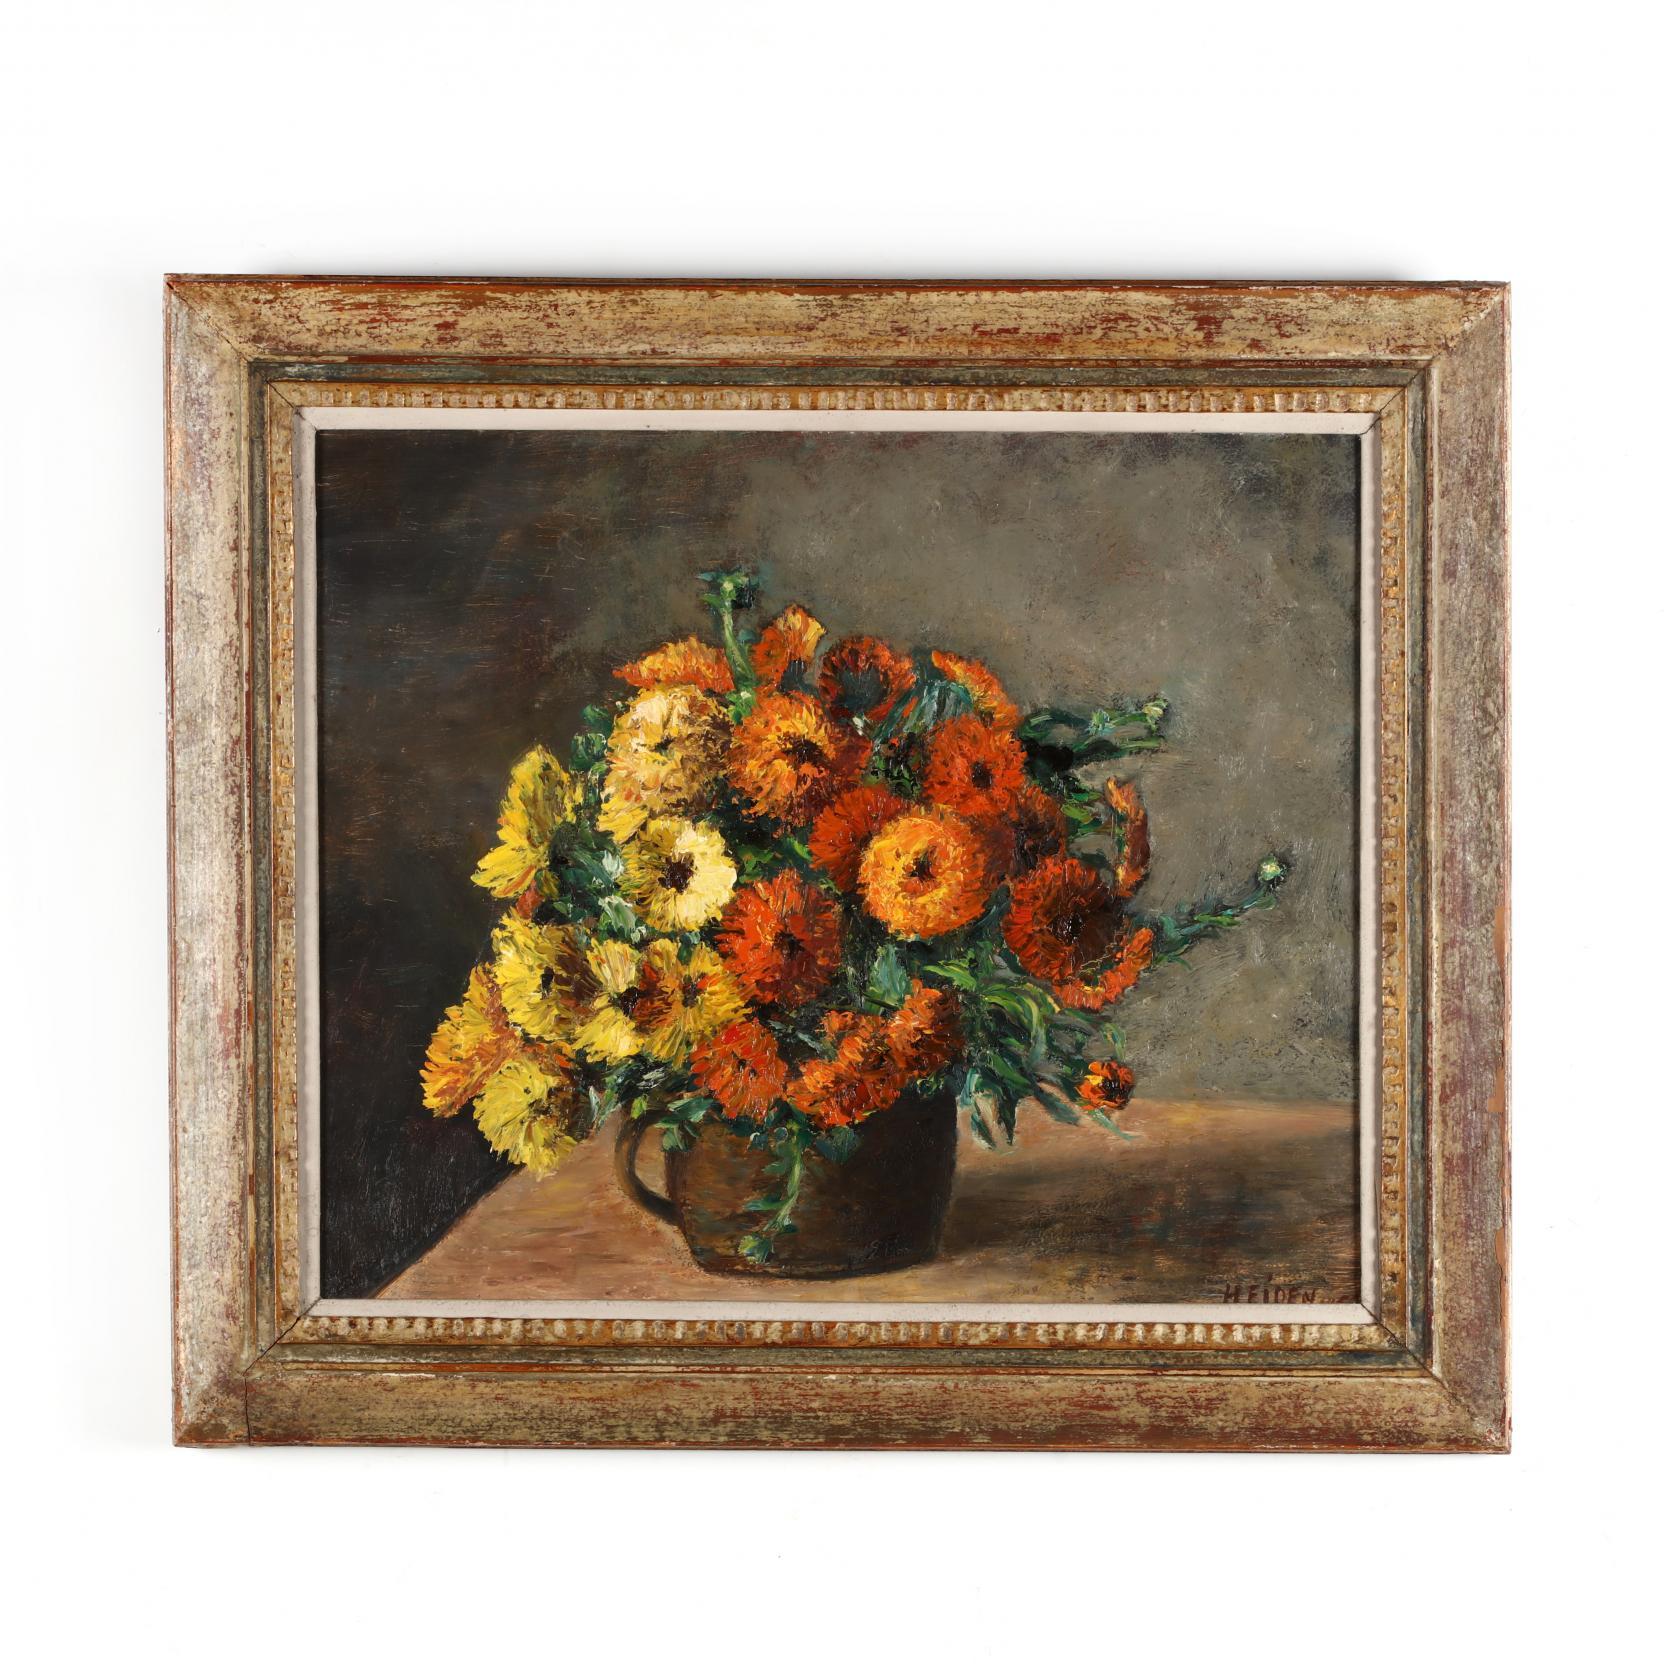 a-vintage-french-school-still-life-of-zinnias-i-fleurs-soucis-i